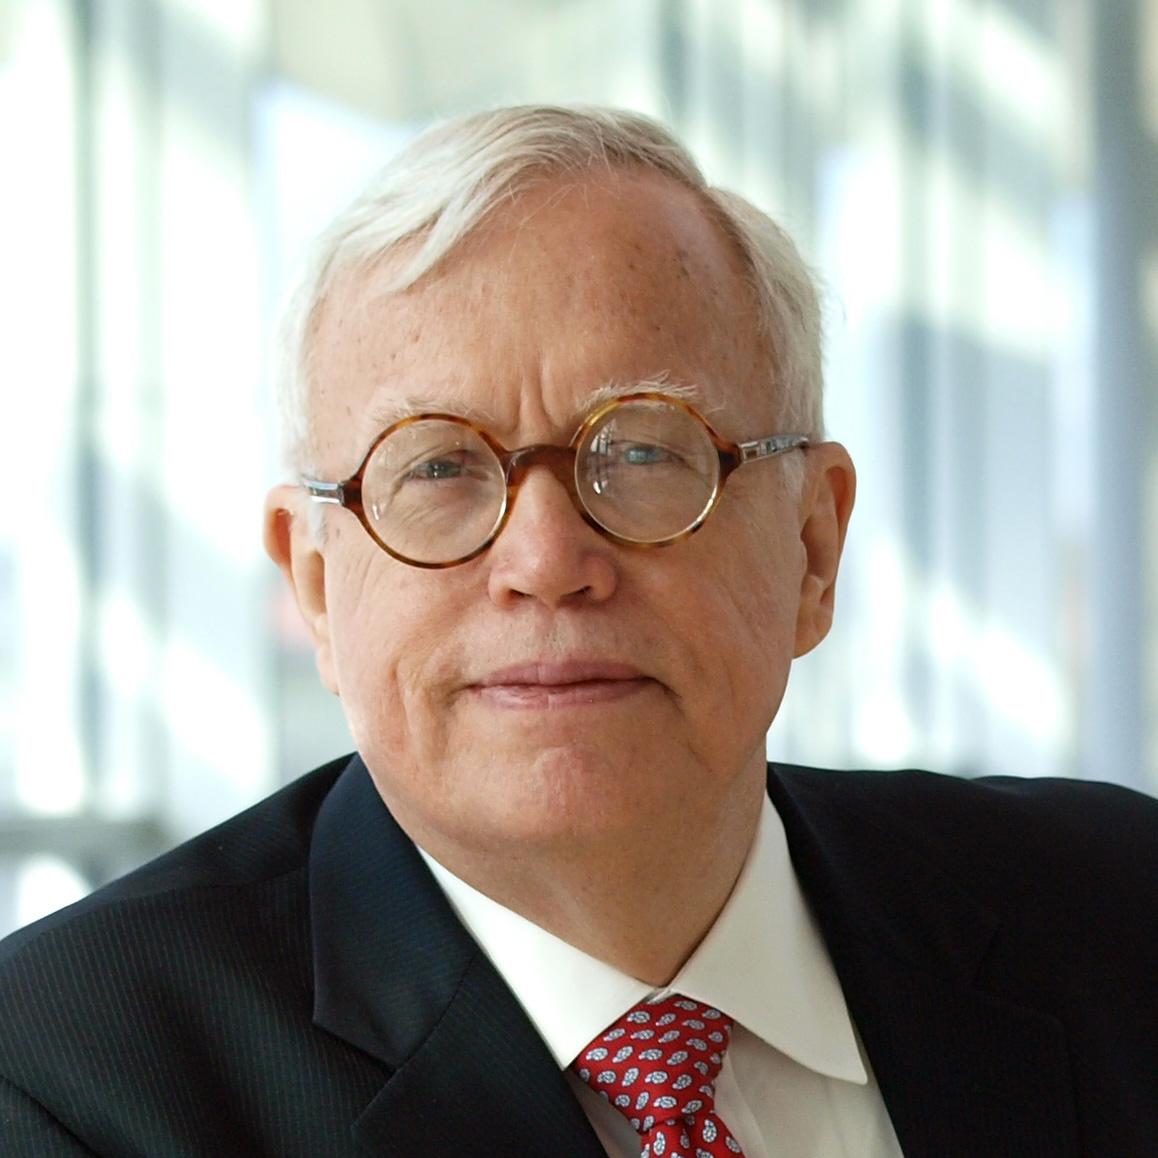 Distinguished economist James Heckman visits King Saud University